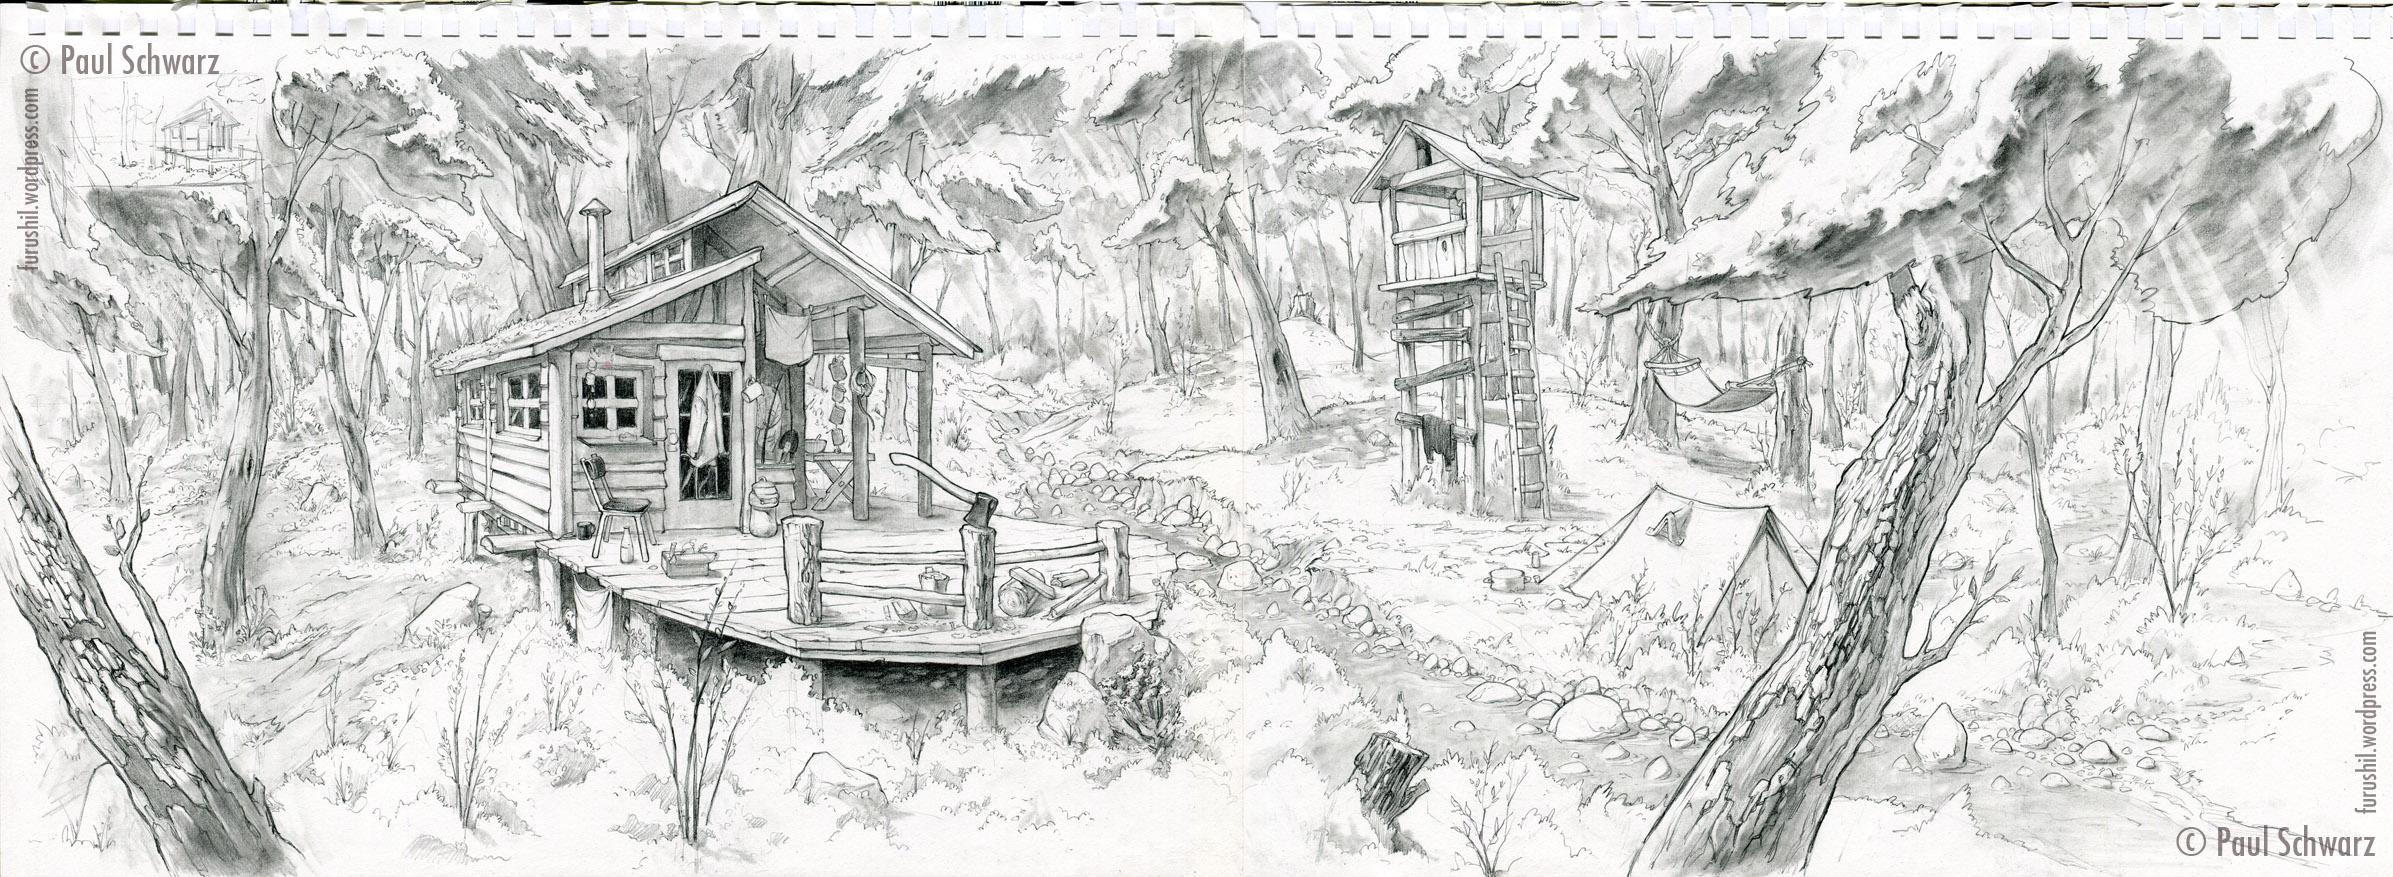 Drawn background pencil sketch #5